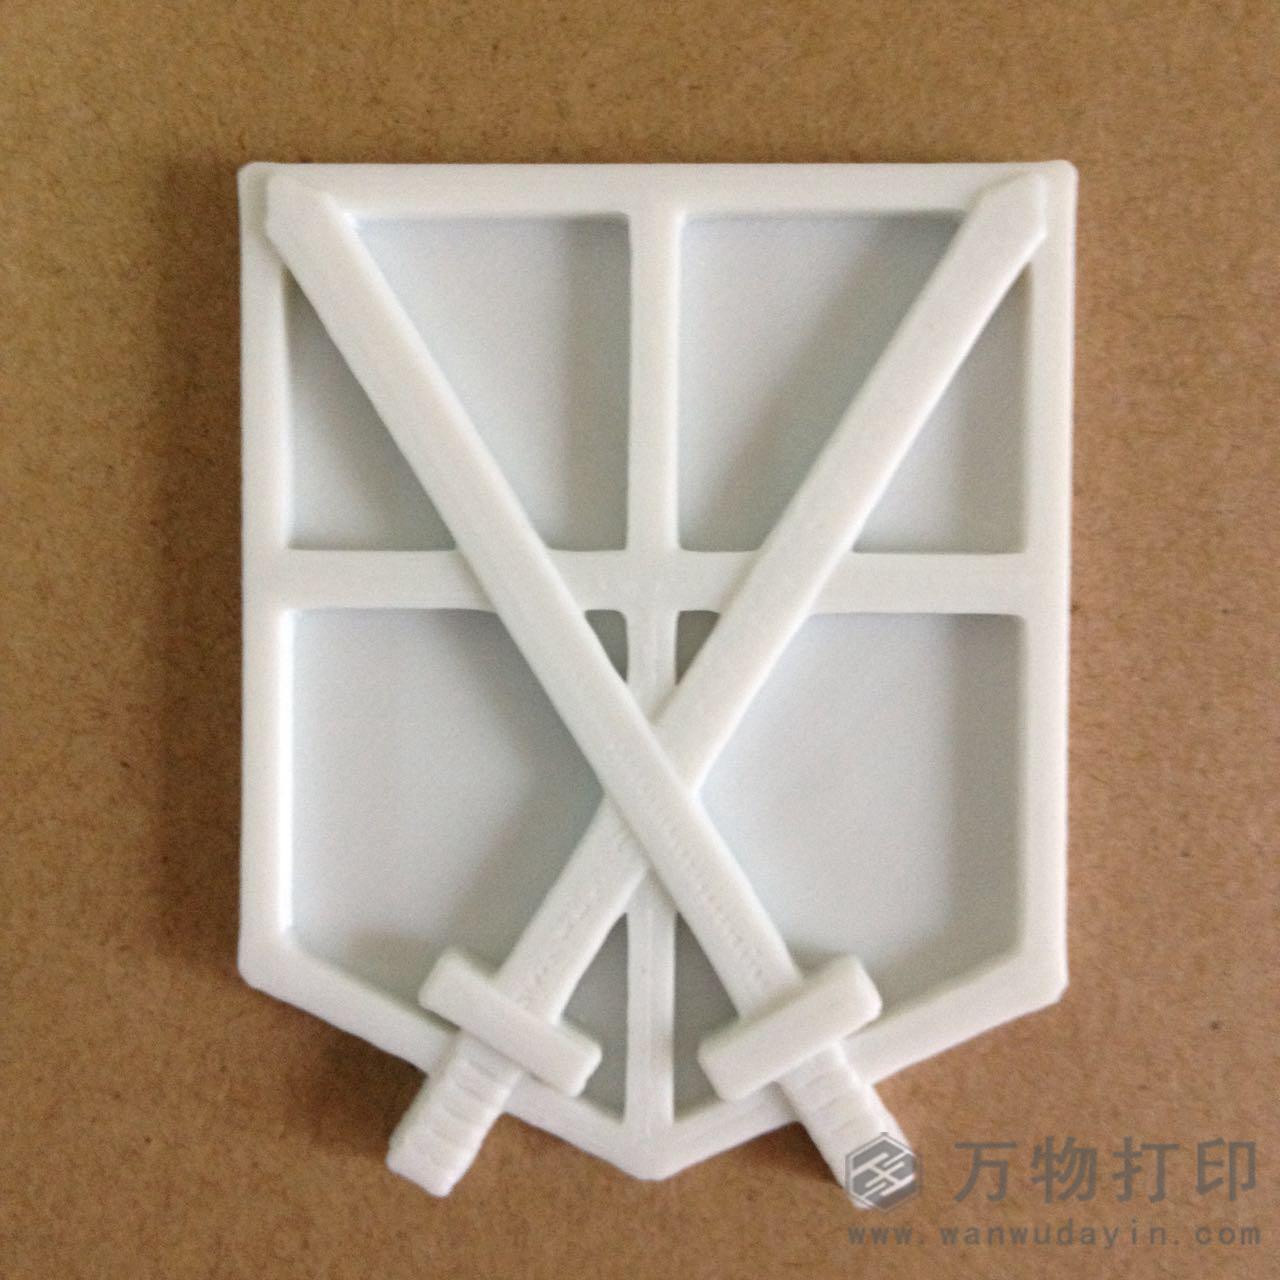 3D打印 训练兵团徽章【初级版】模型图片、模型下载、STL文件下载